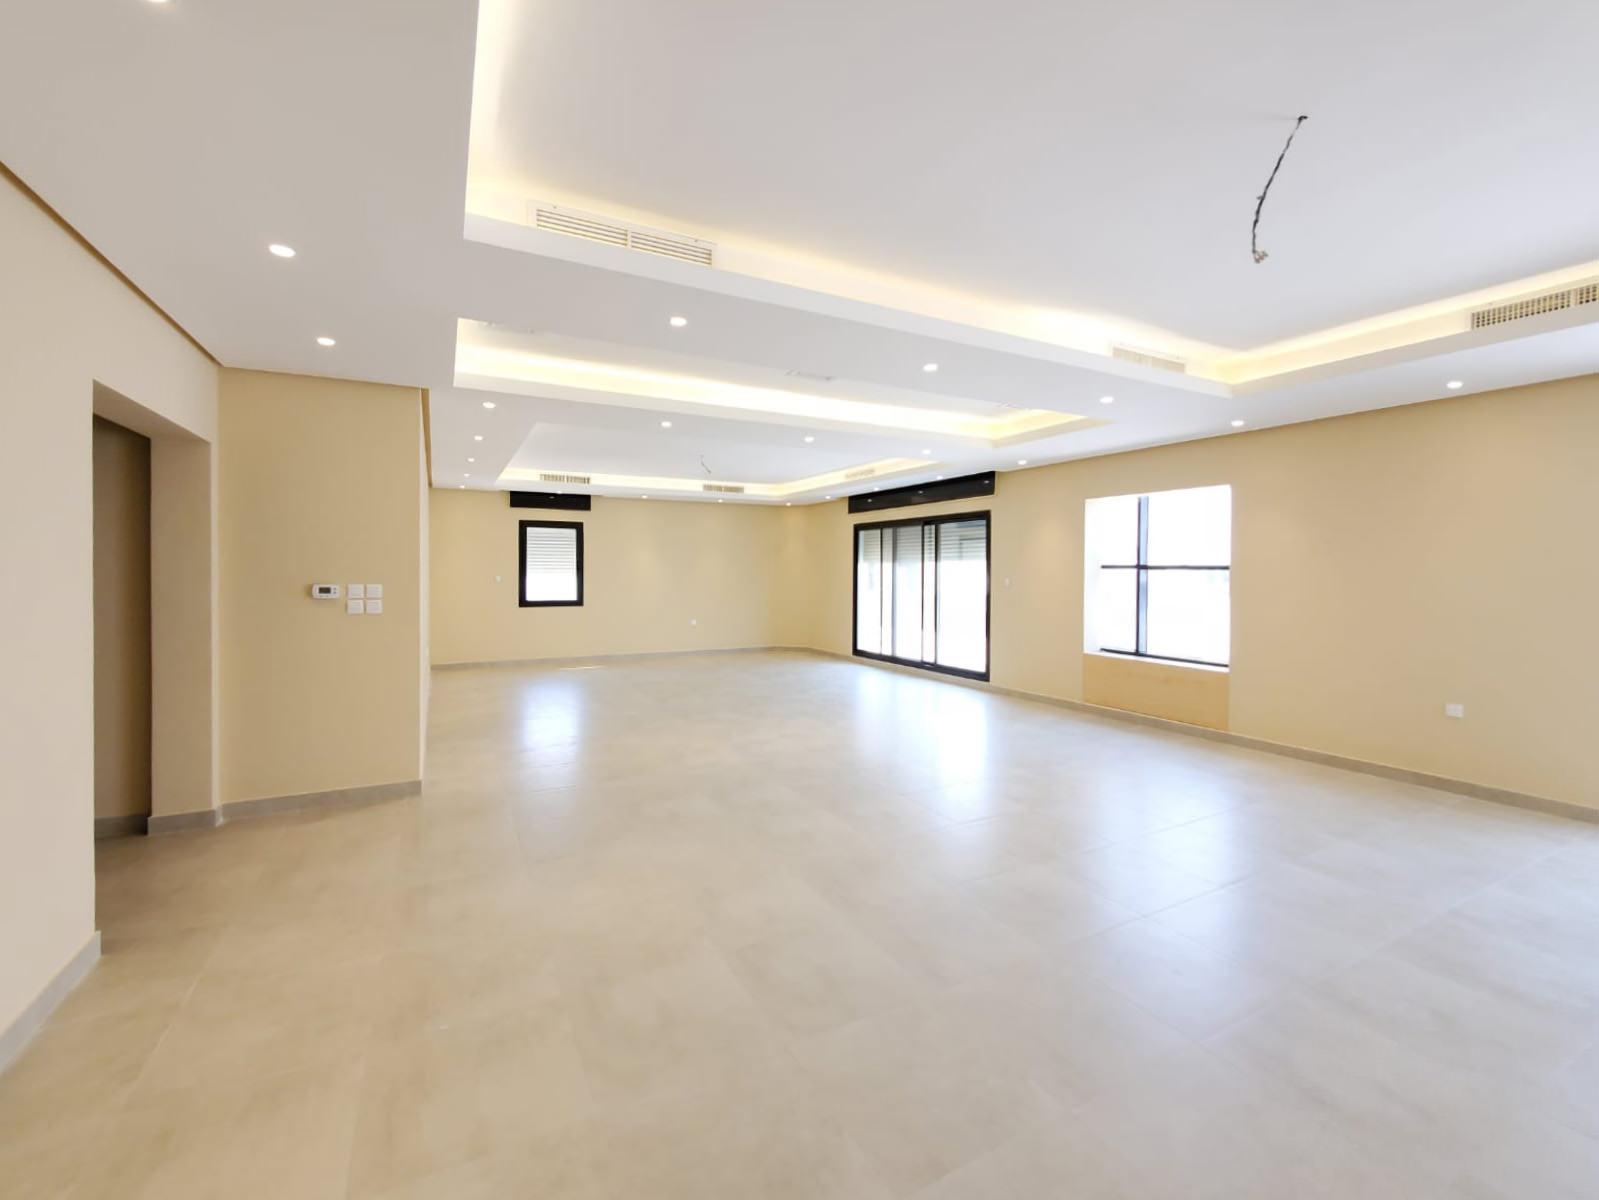 Fnaitees – large, ufnurnished, four bedroom floor w/balcony